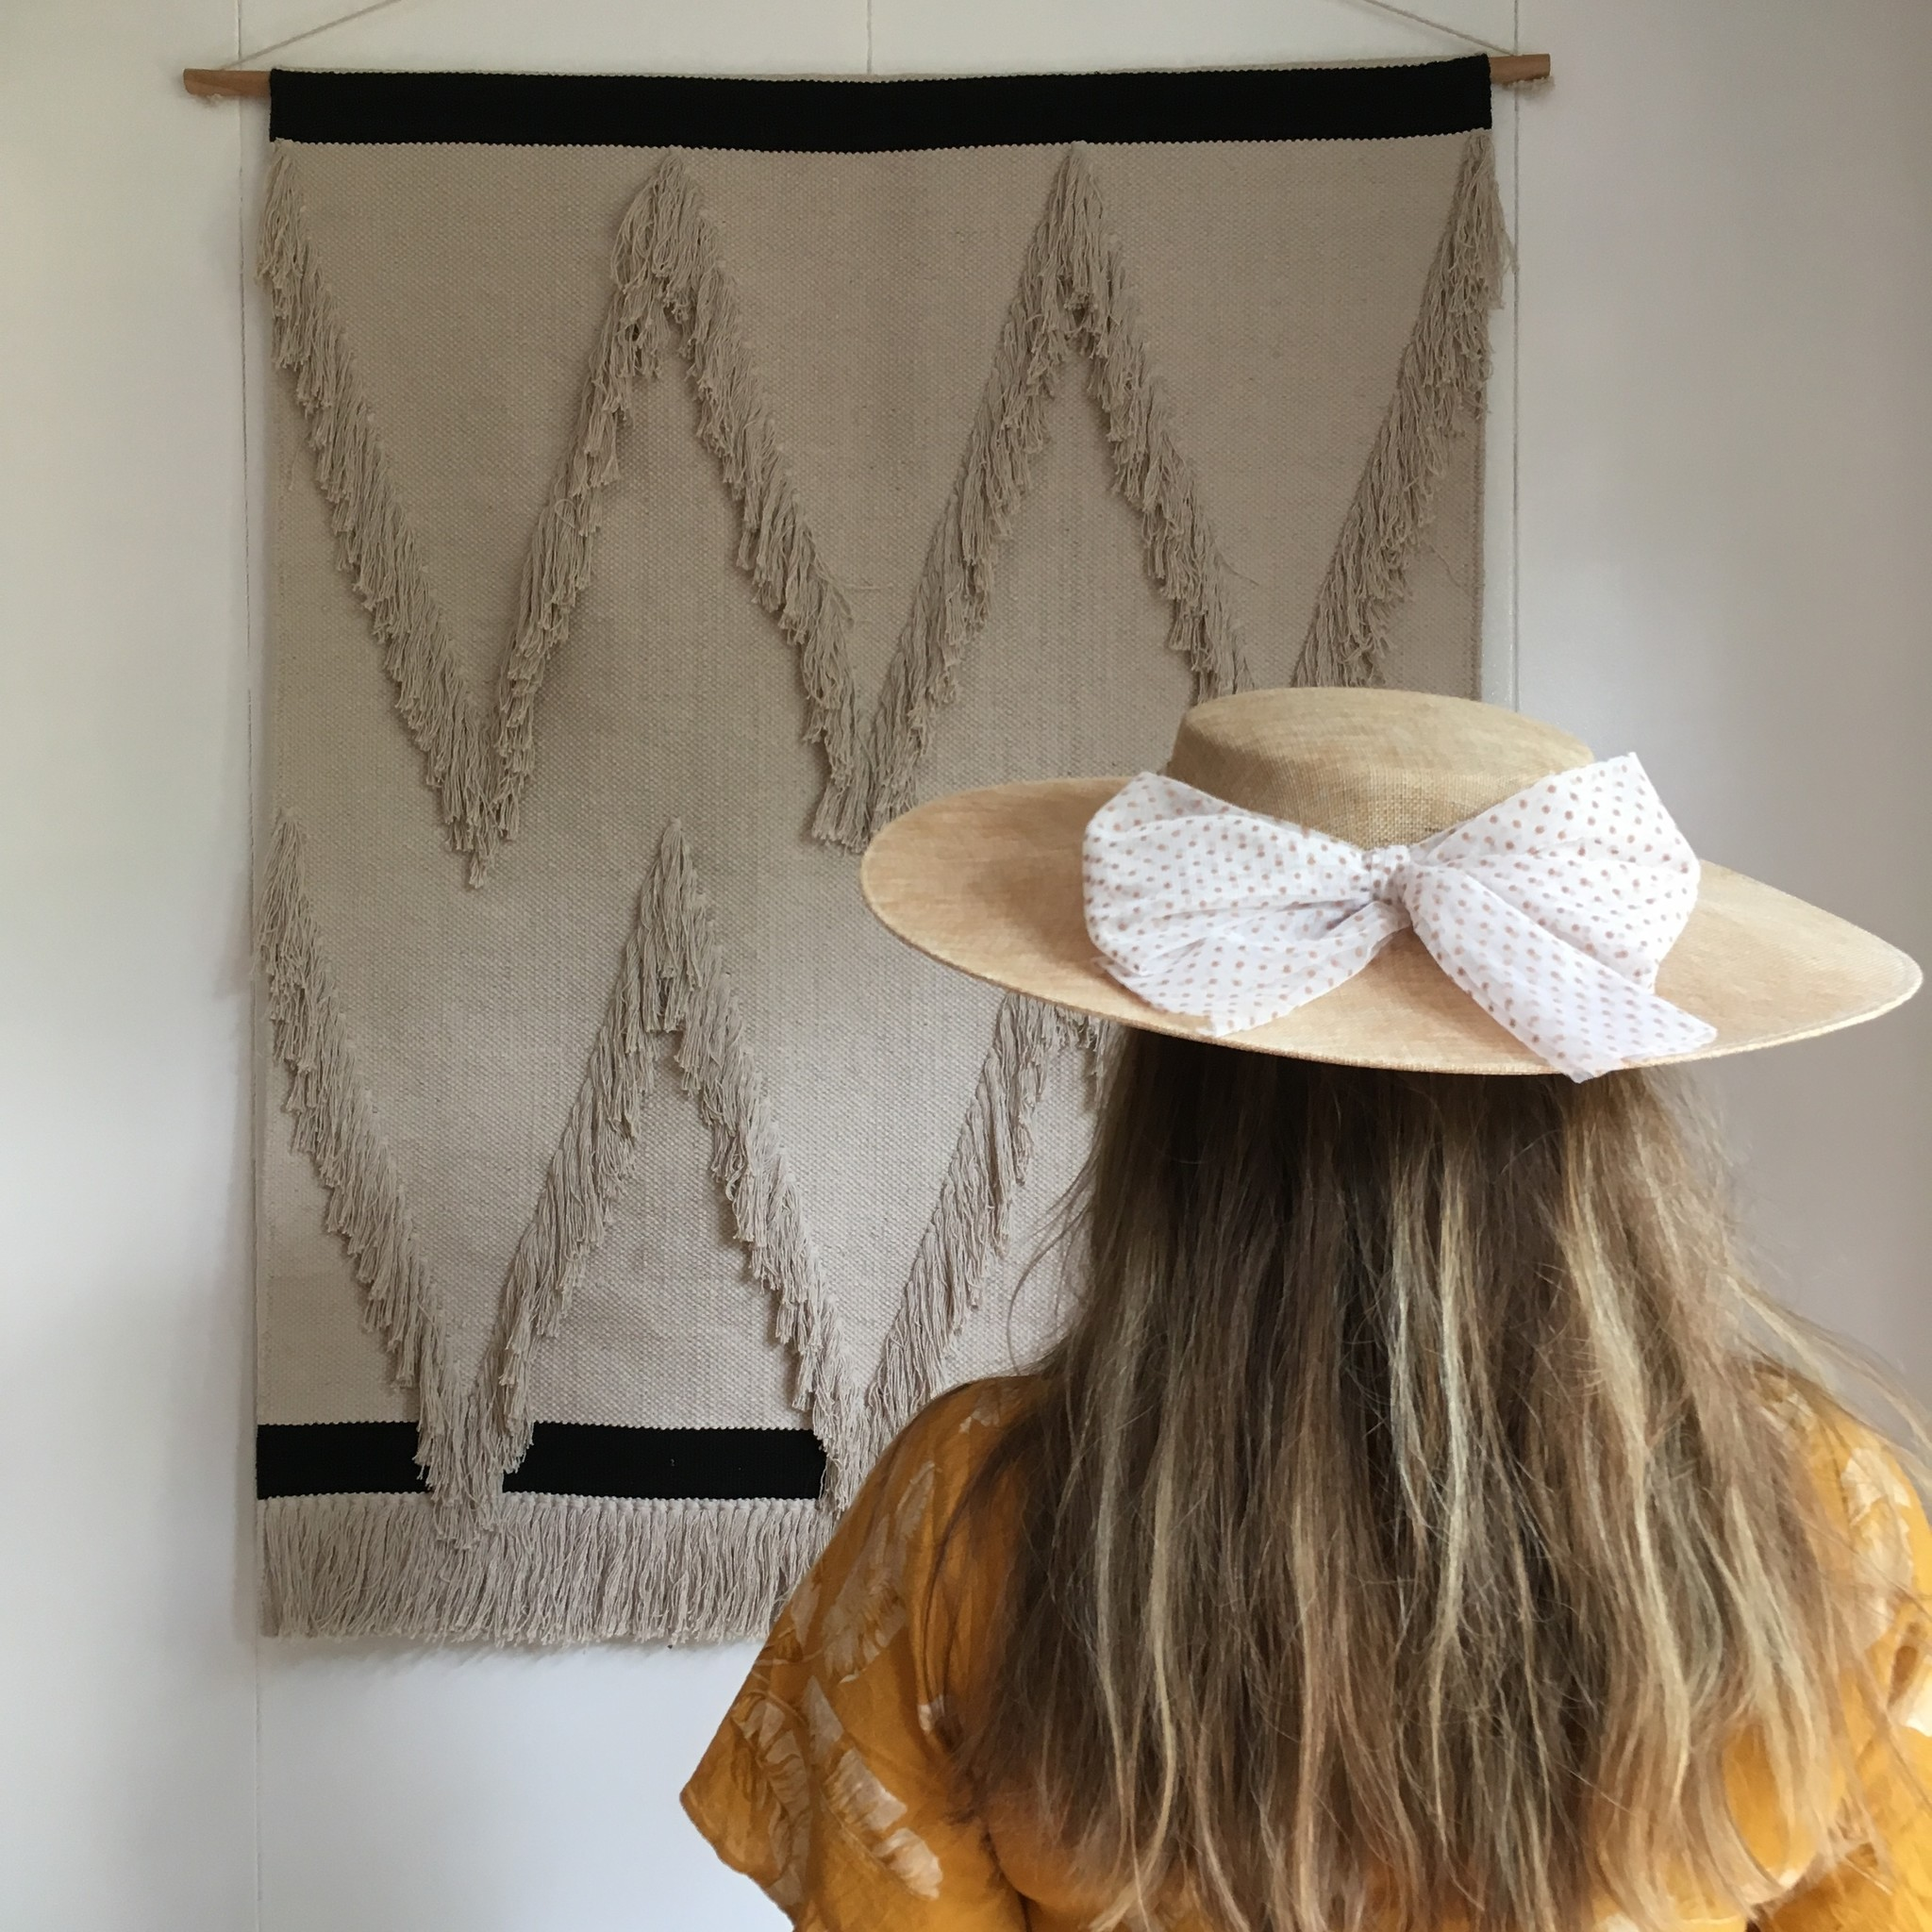 Siena - zomer hoed / PADUA hoed  - kind & dames -beige polkadot strik